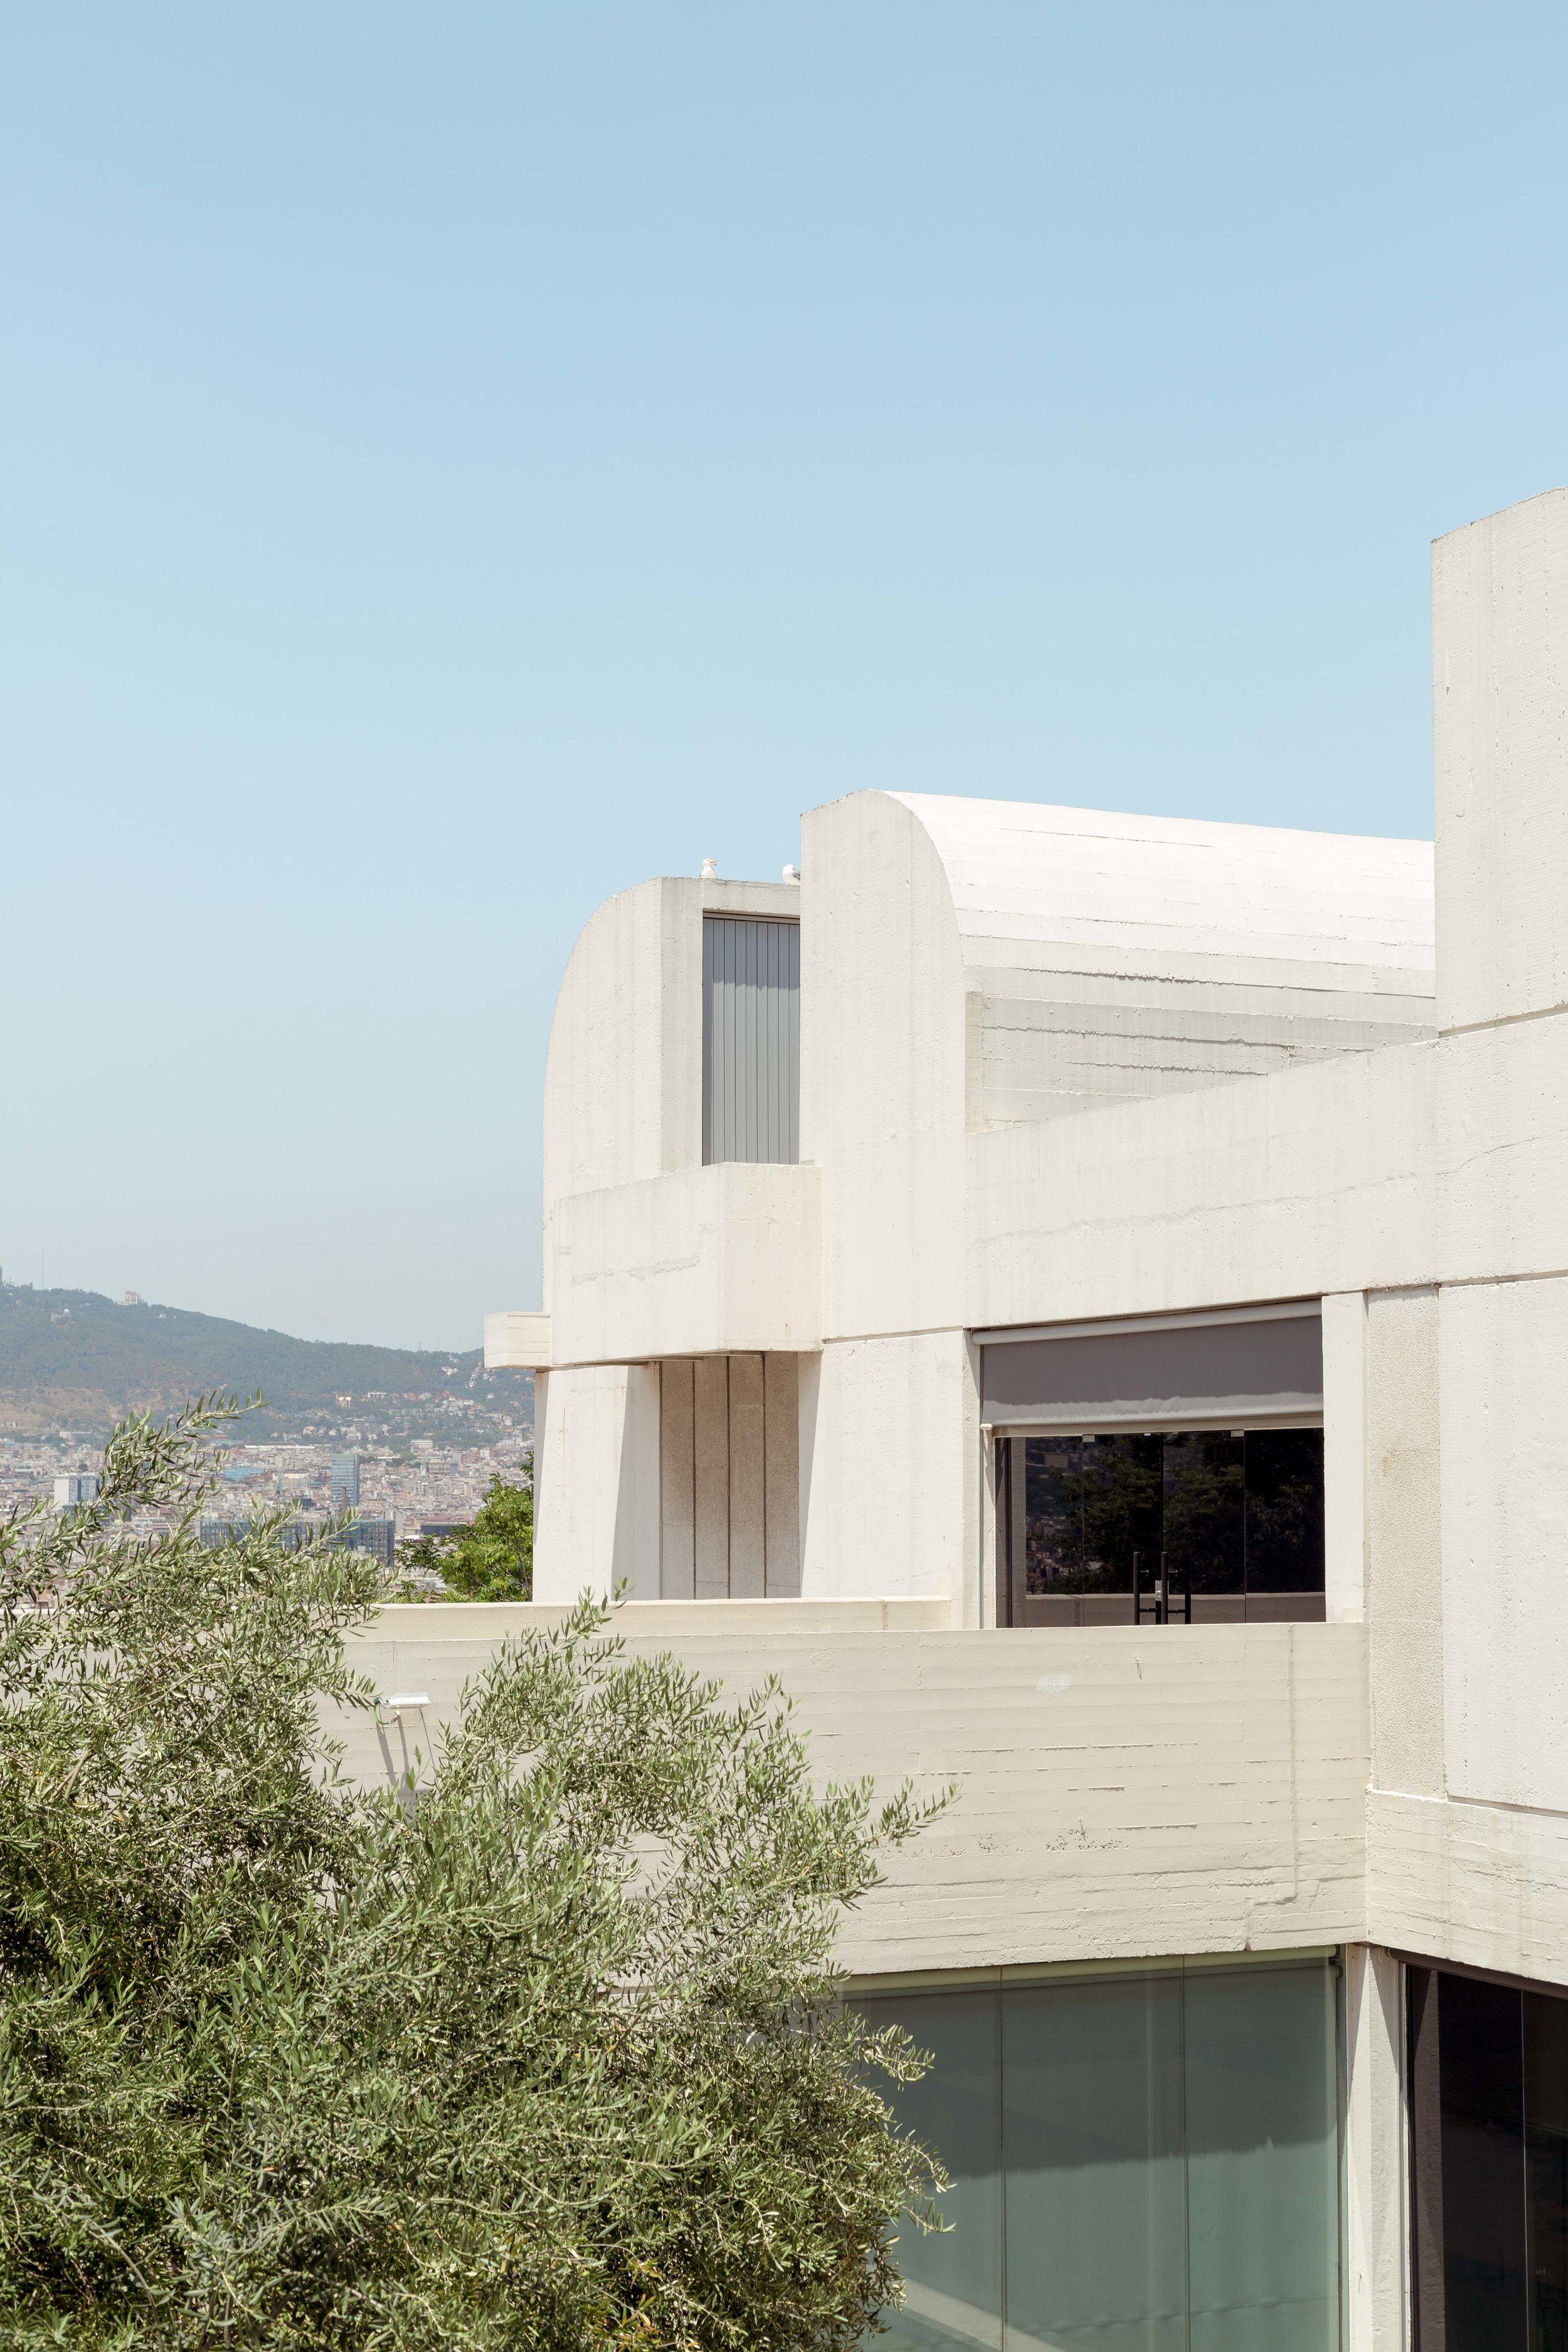 Architectural photograph series of the Fundació Joan Miró, Barcelona. Museum of modern art honoring Joan Miró designed by architect Josep Lluís Sert. By Daniel Walker Photography